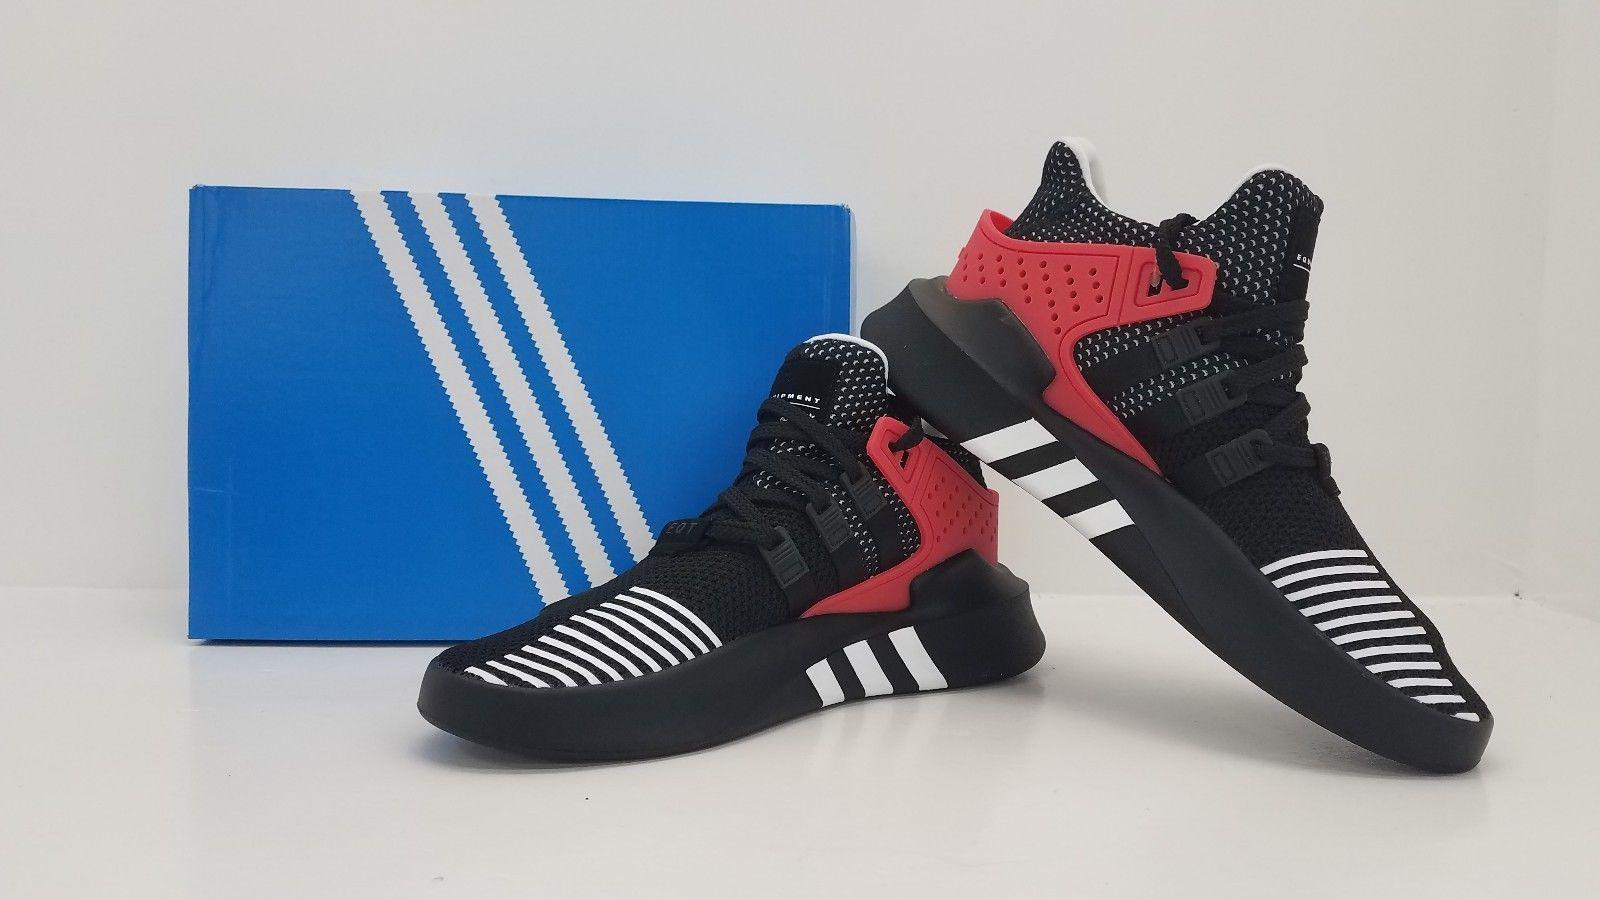 quality design 47d80 ddf3d Adidas ORIGINALS MEN'S EQT BASK ADV AQ1013 BLACK/WHITE/RED ...